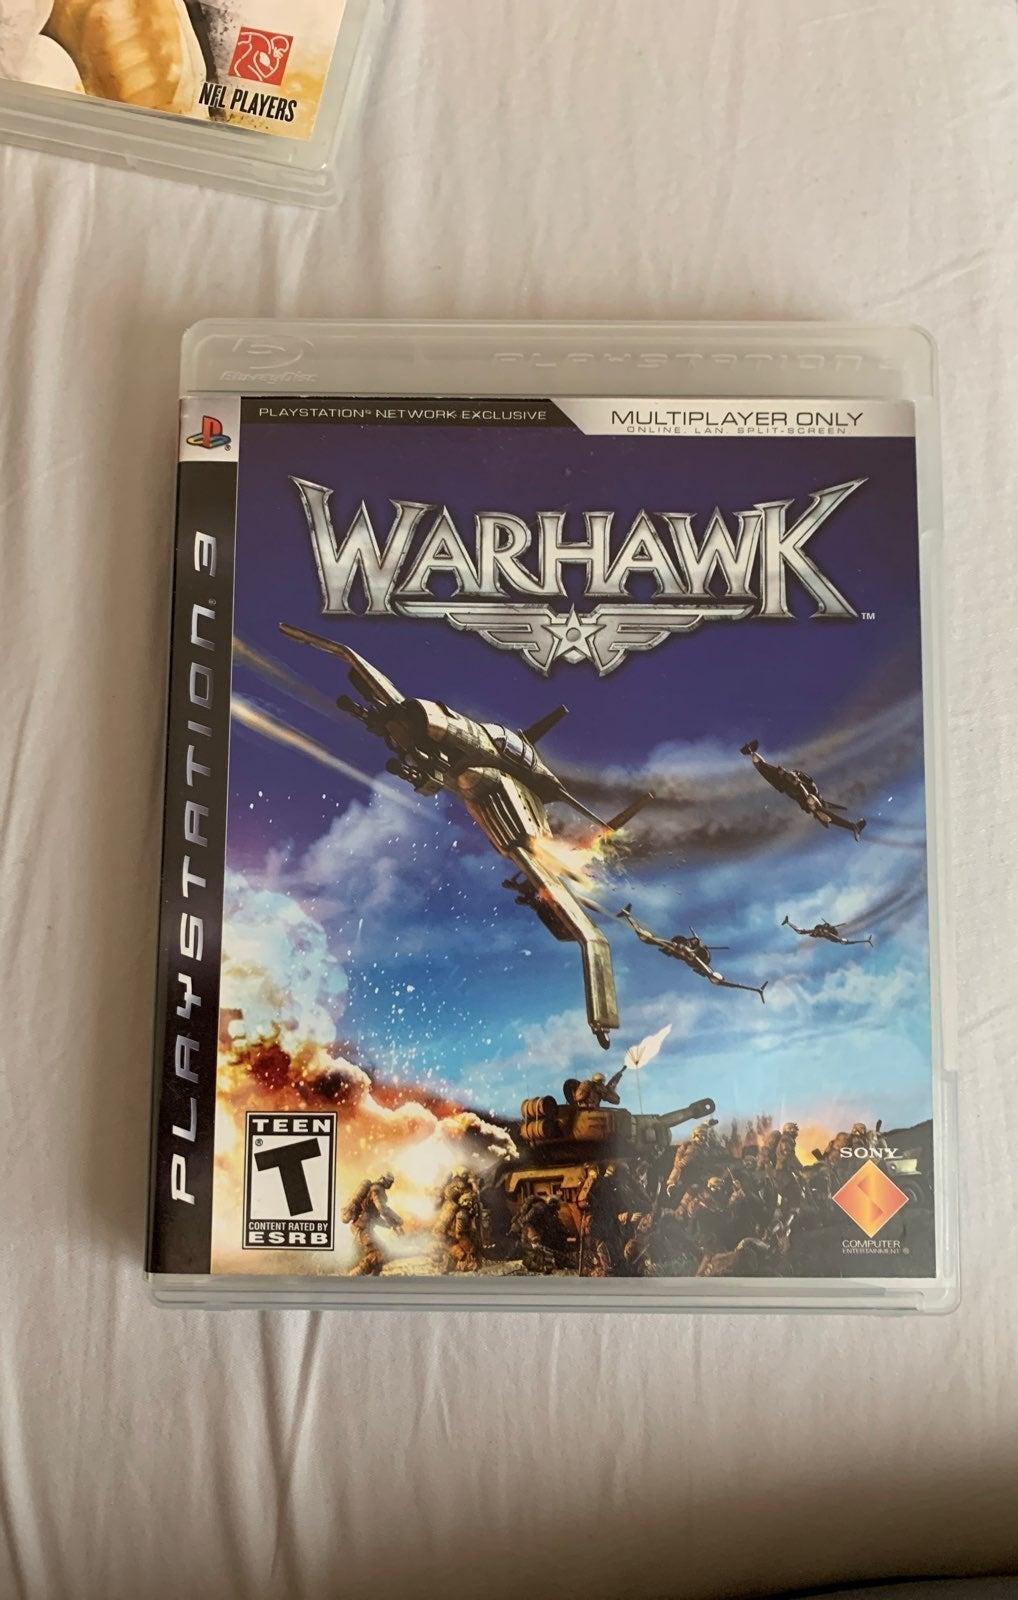 Warhawk PS3 game